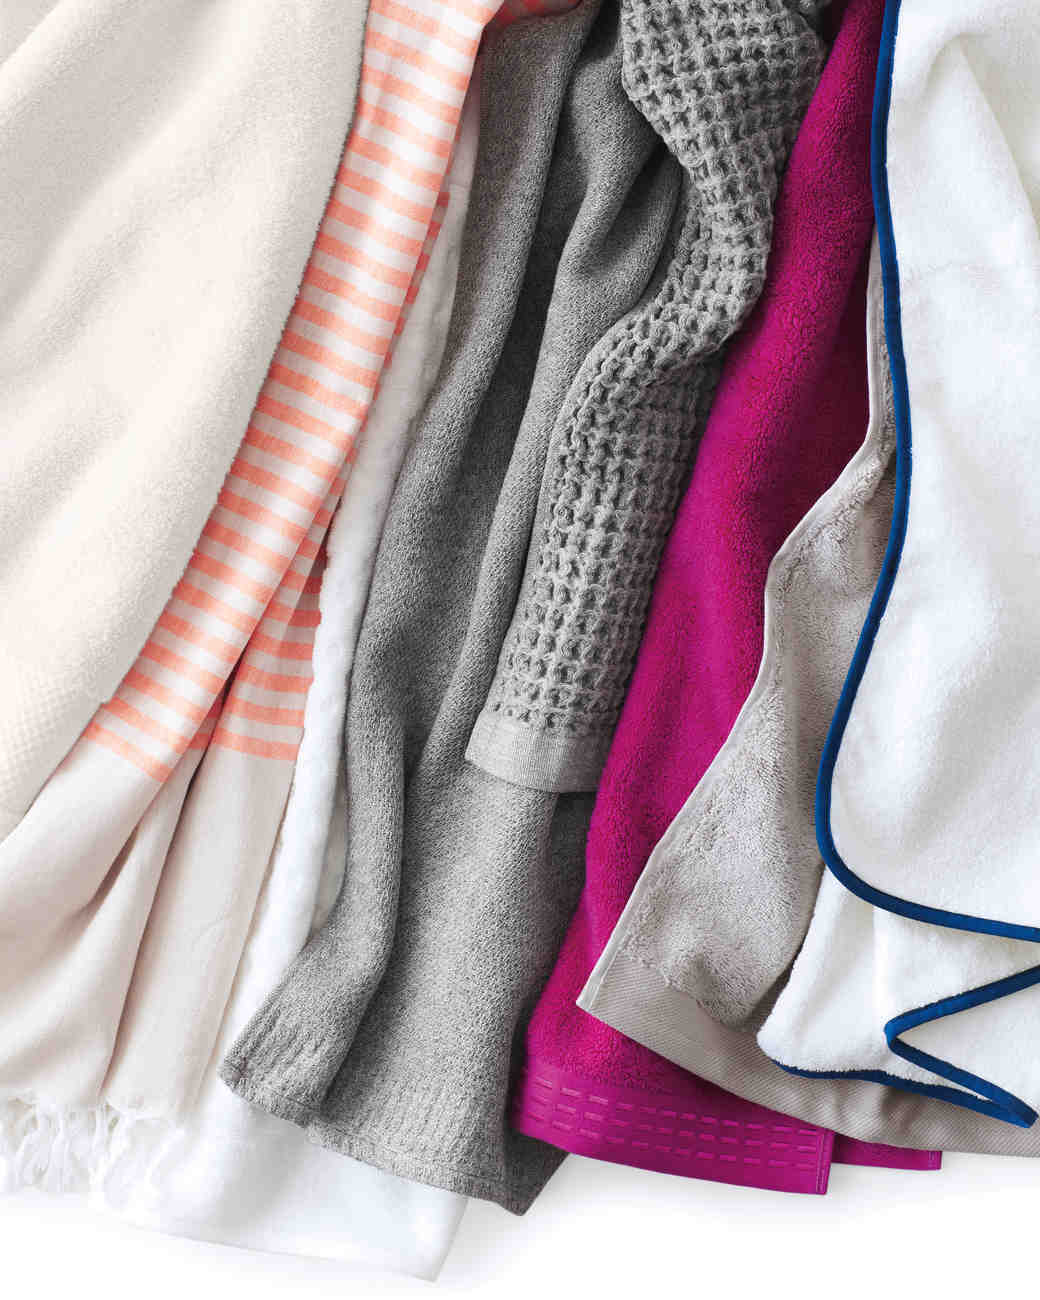 towels-009-mwd109984.jpg